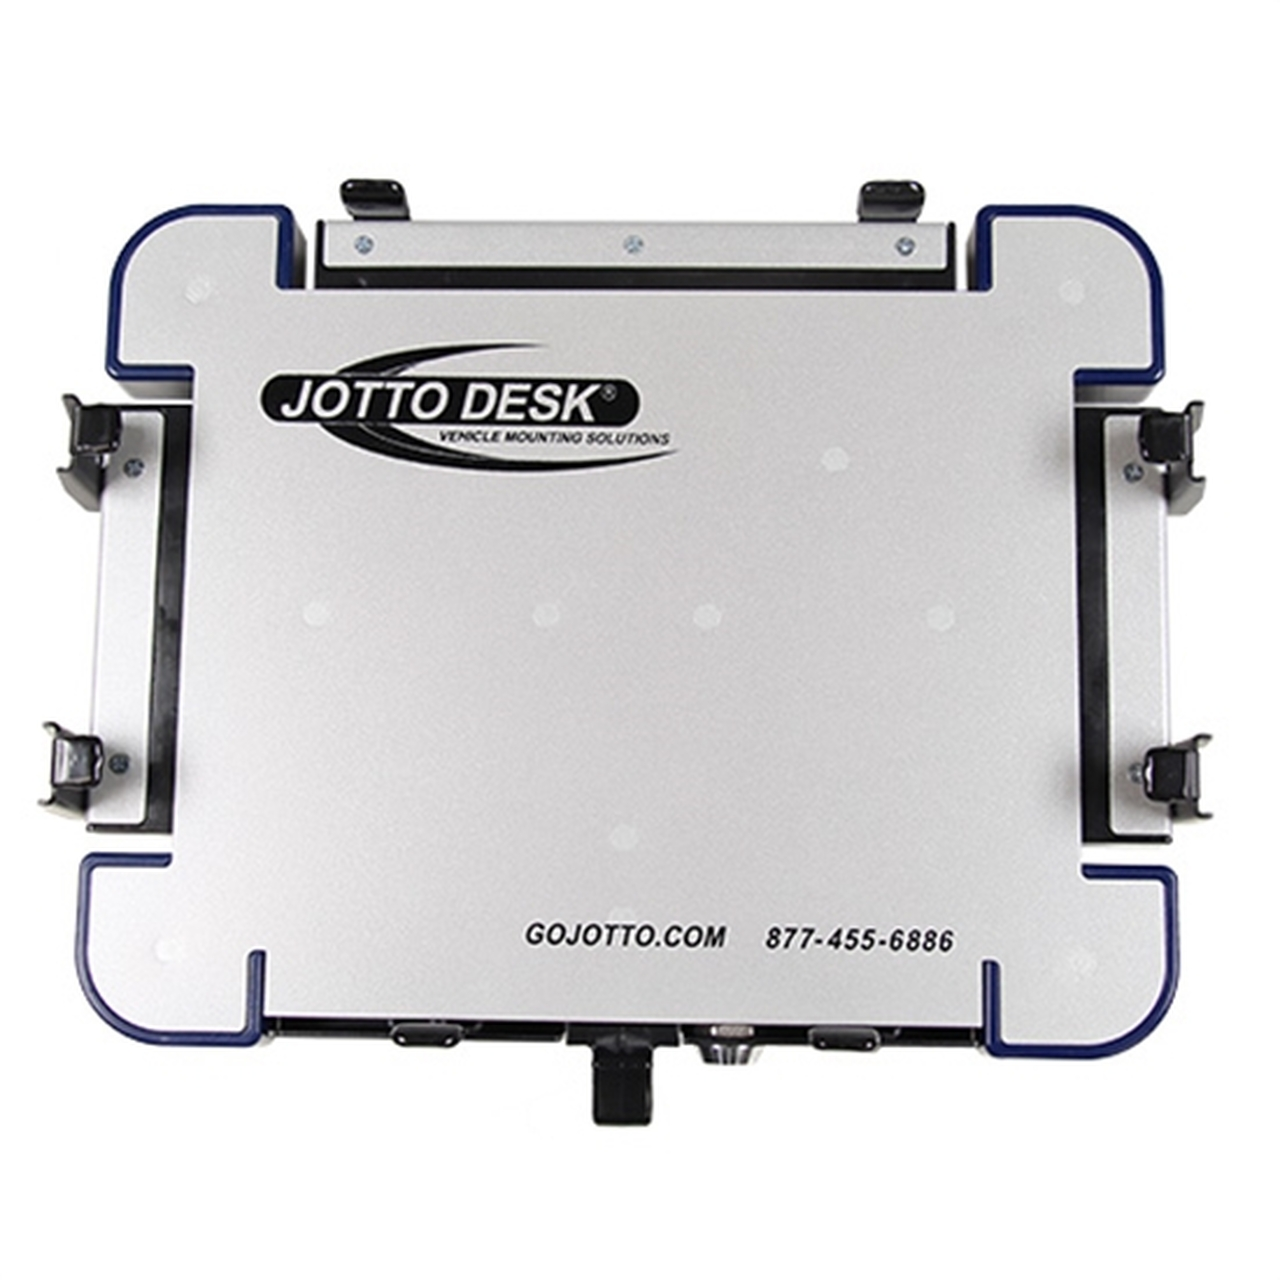 Jottodesk A-MOD Chevy Silverado/GMC Sierra 1500 (2014+) Silverado/GMC Sierra 2500-3500 (2015+) Rugged Laptop Computer Mount